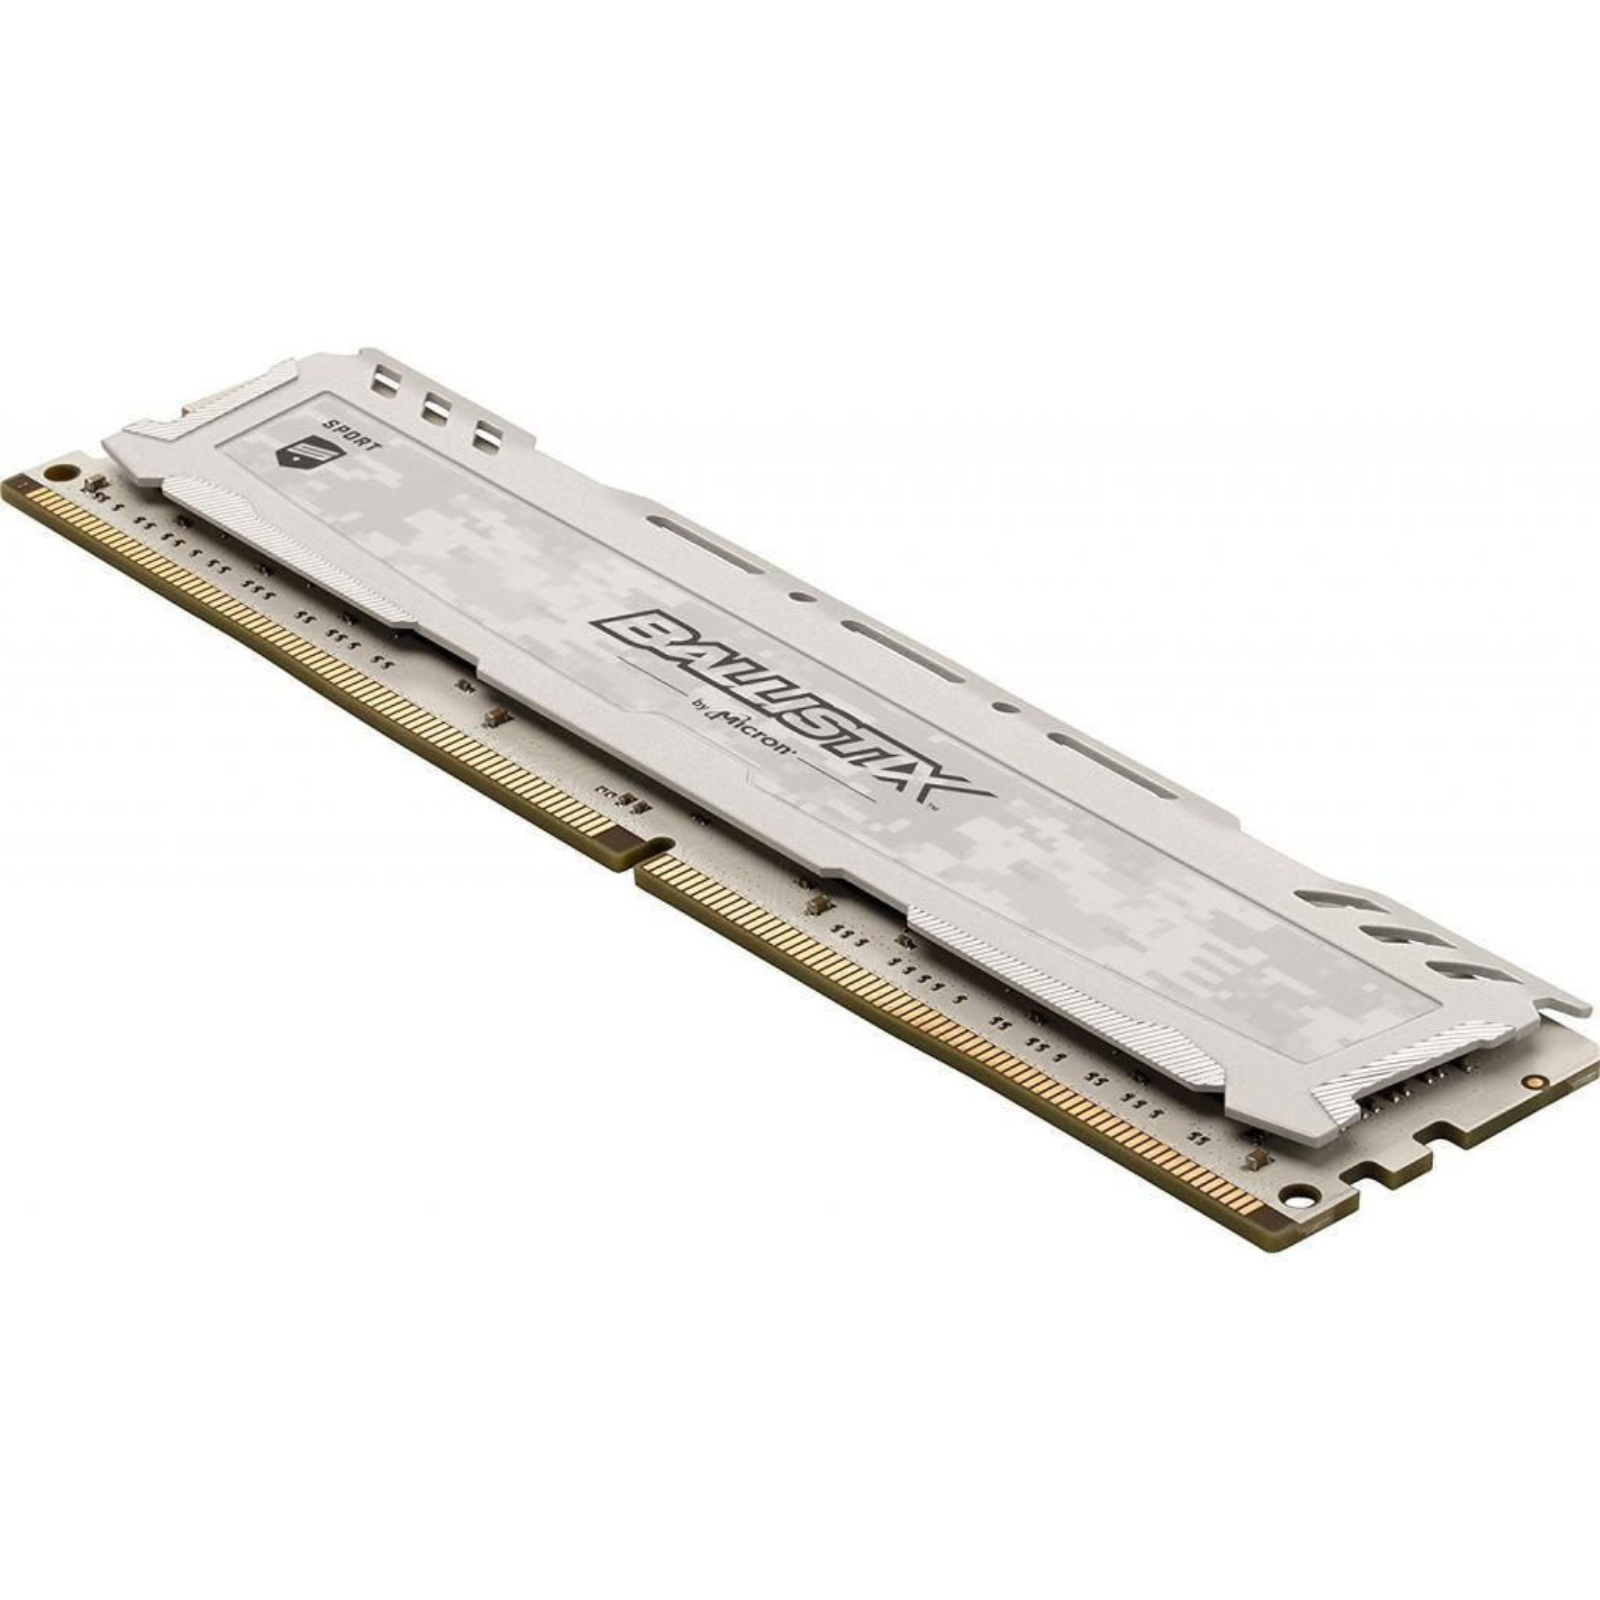 Модуль памяти для компьютера DDR4 8GB 2666 MHz Ballistix Sport LT White MICRON (BLS8G4D26BFSCK) изображение 4